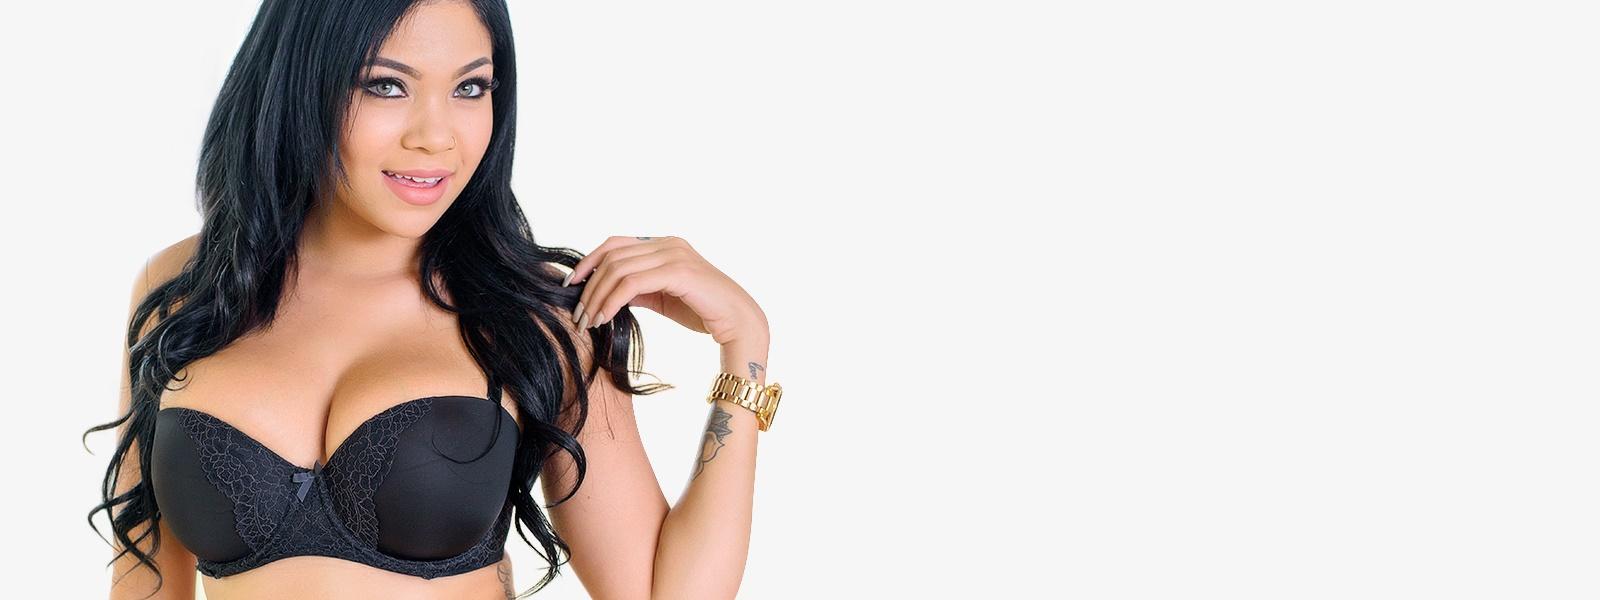 Cassidy Banks Background Image